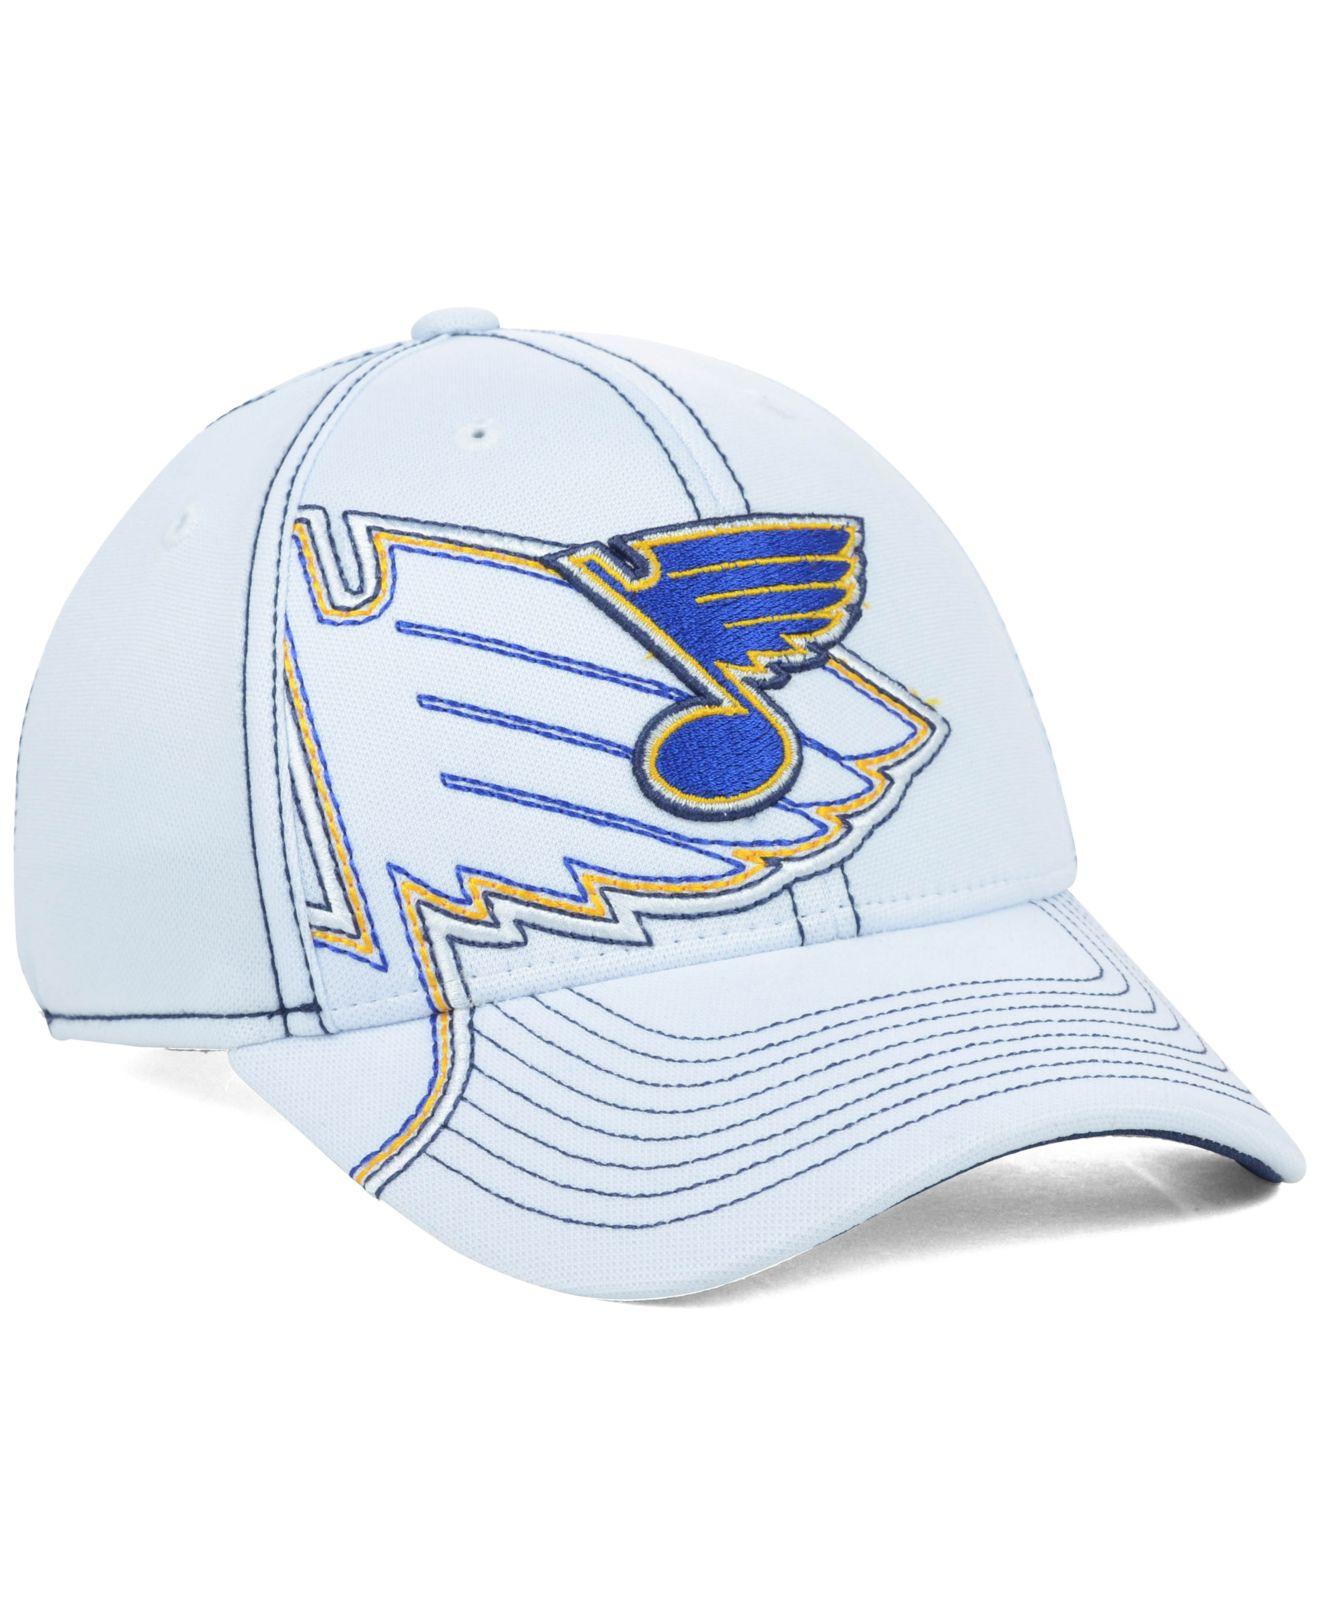 low priced 87f2a 4852c ... store lyst reebok st louis blues nhl 2nd season draft cap in white for  men 3e325 ...